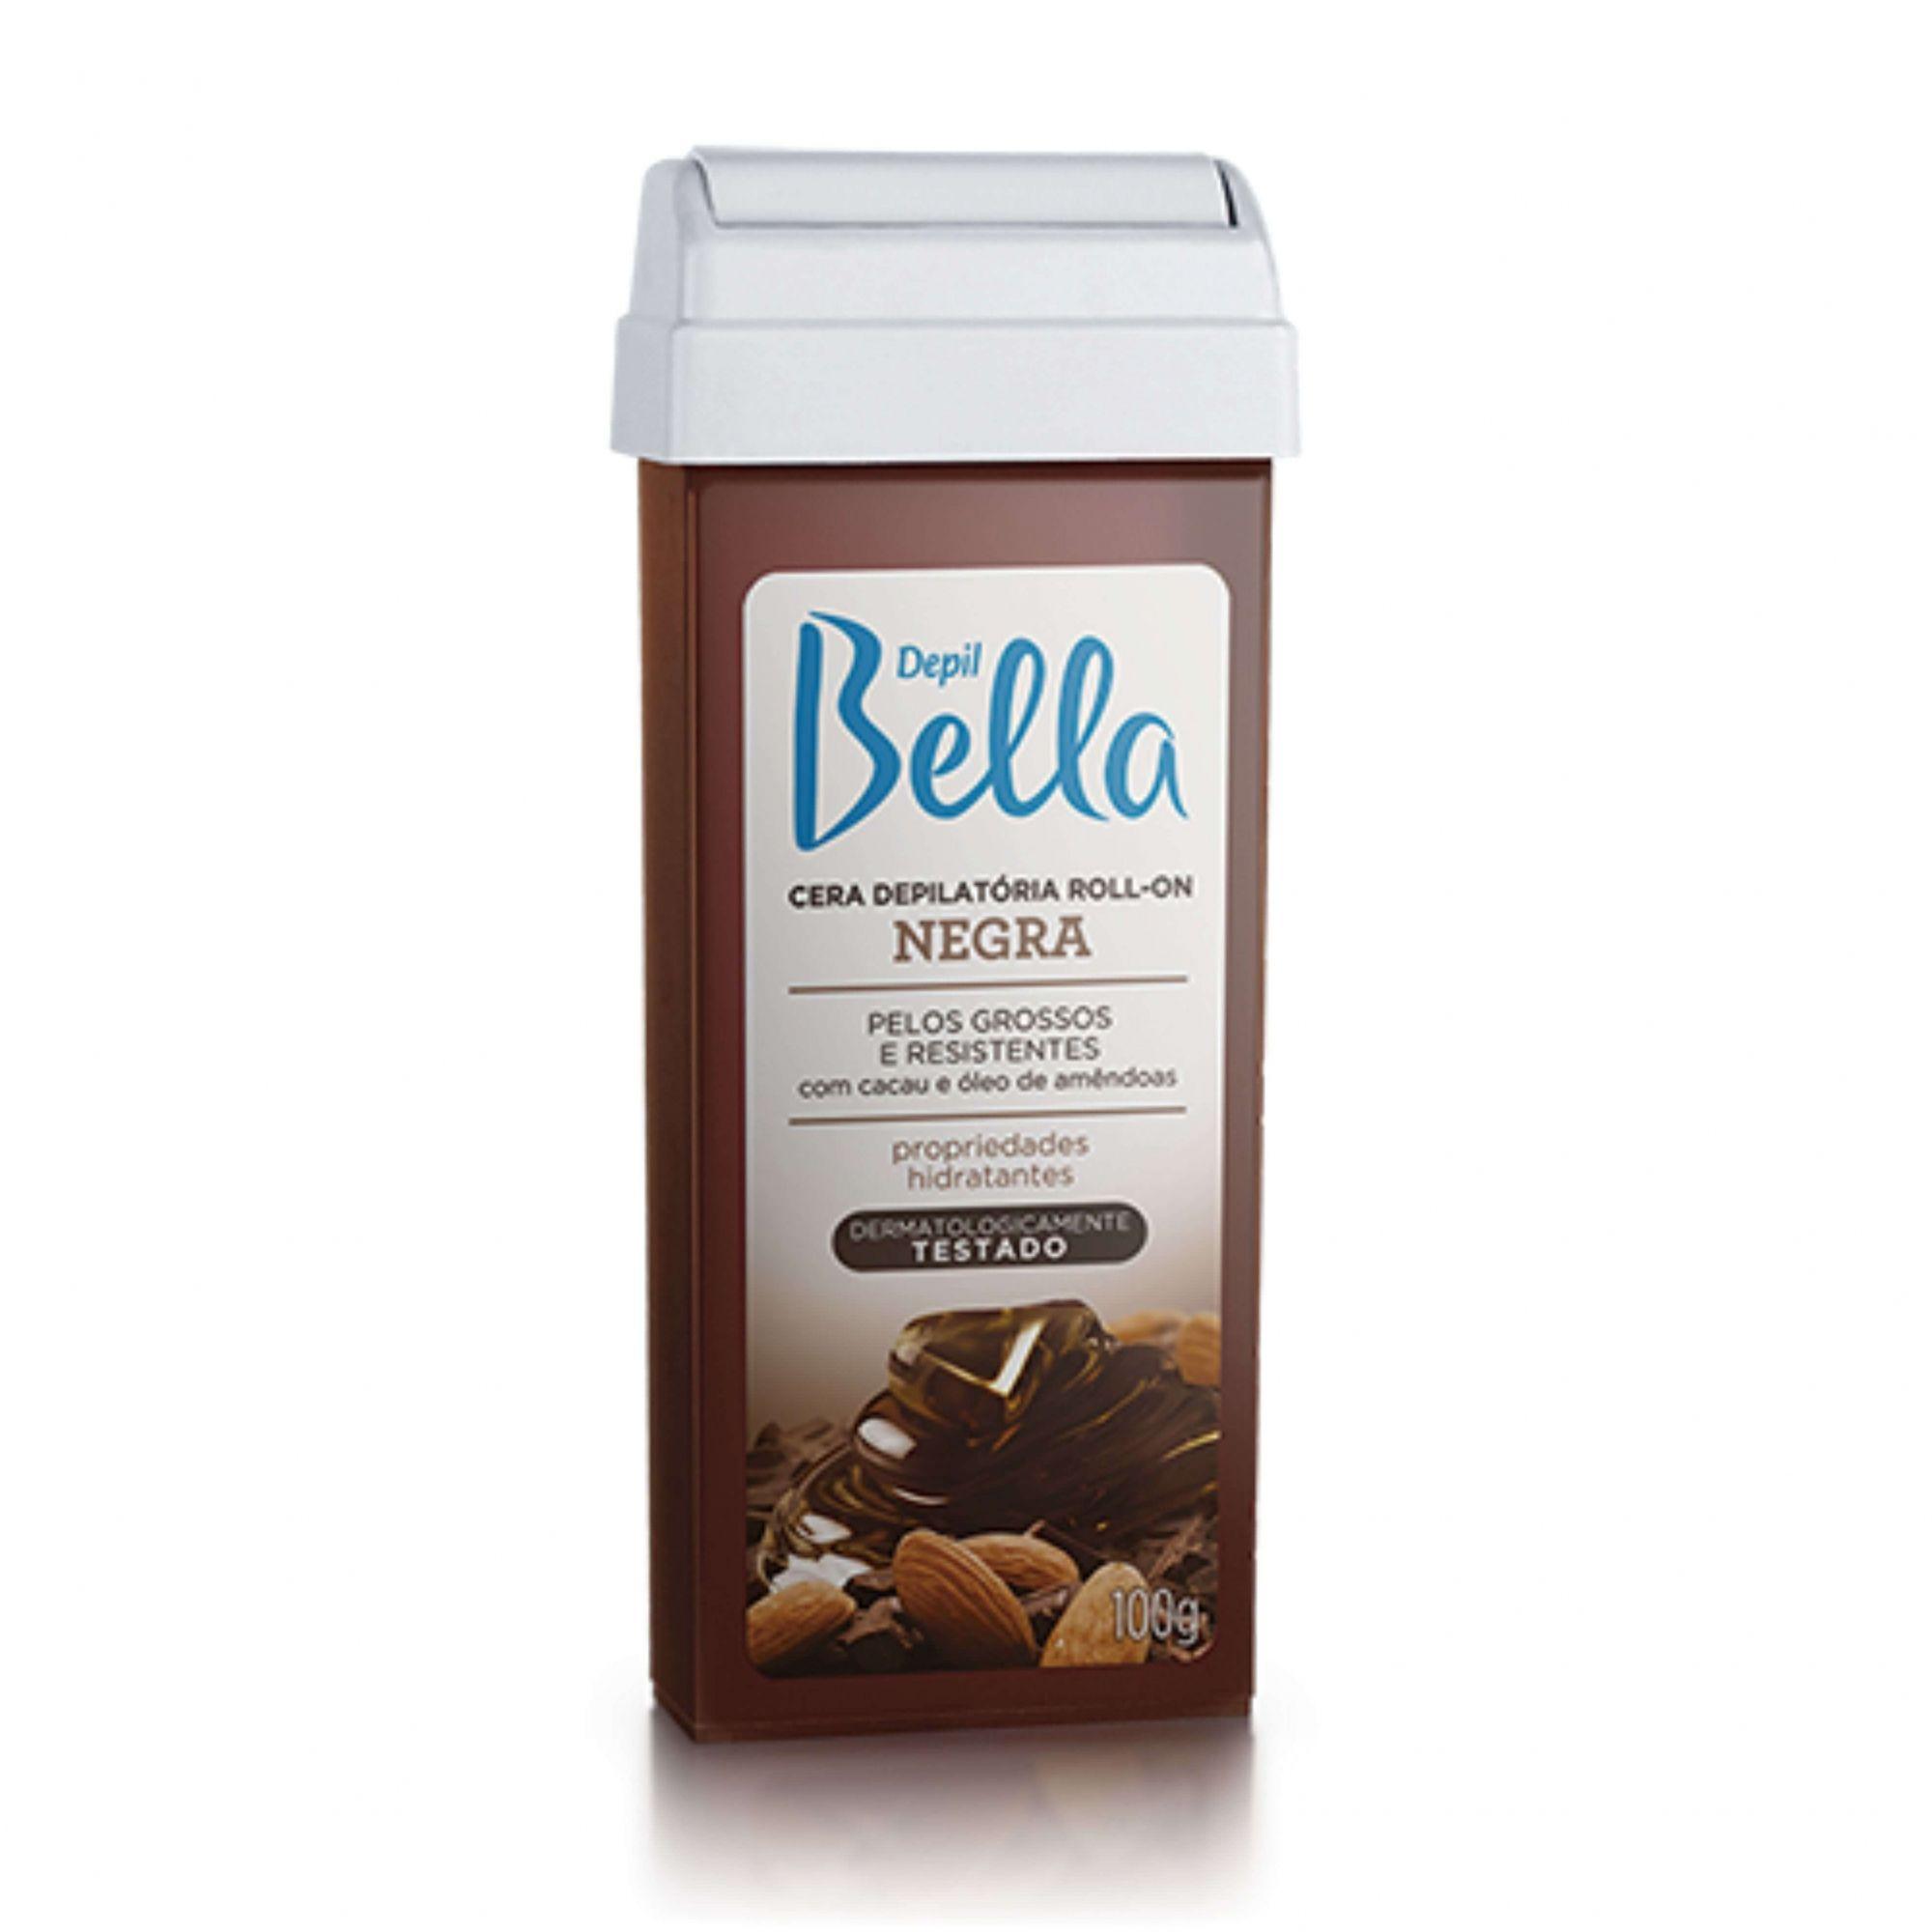 Refil Cera Depilatória Roll-on Negra Depil Bella 100g